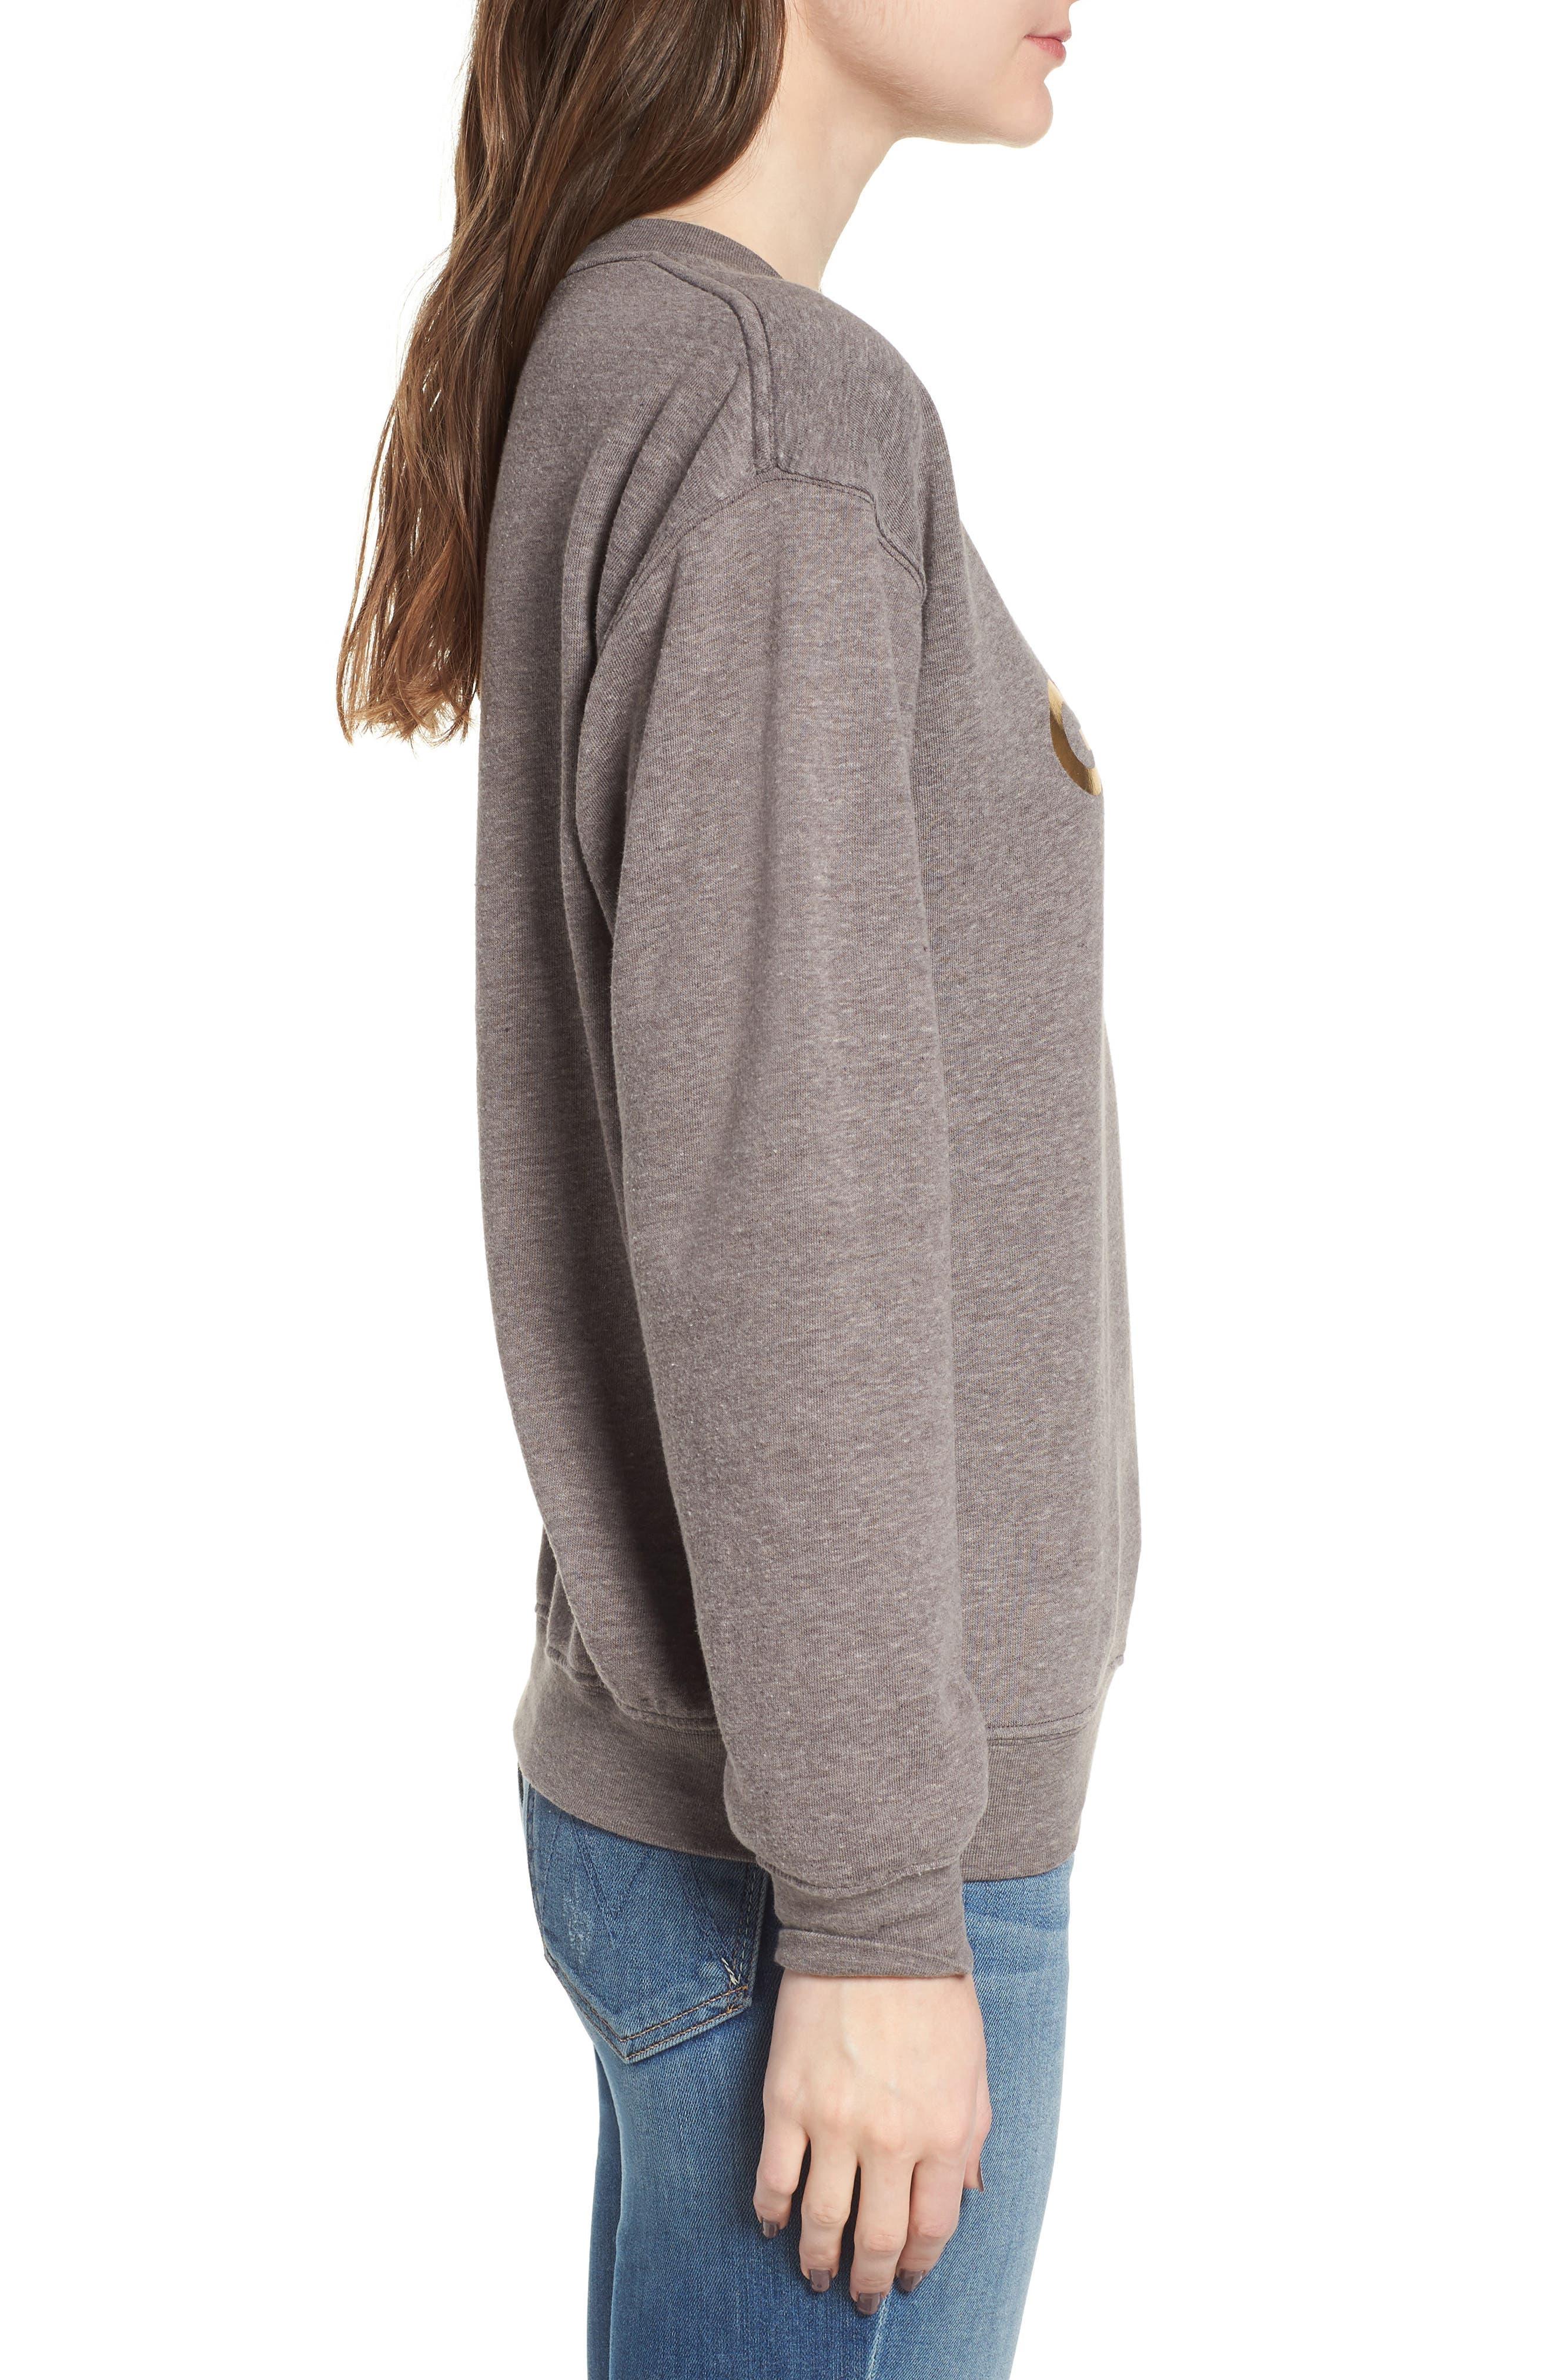 Golden Girls Willow Sweatshirt,                             Alternate thumbnail 3, color,                             Heather Grey